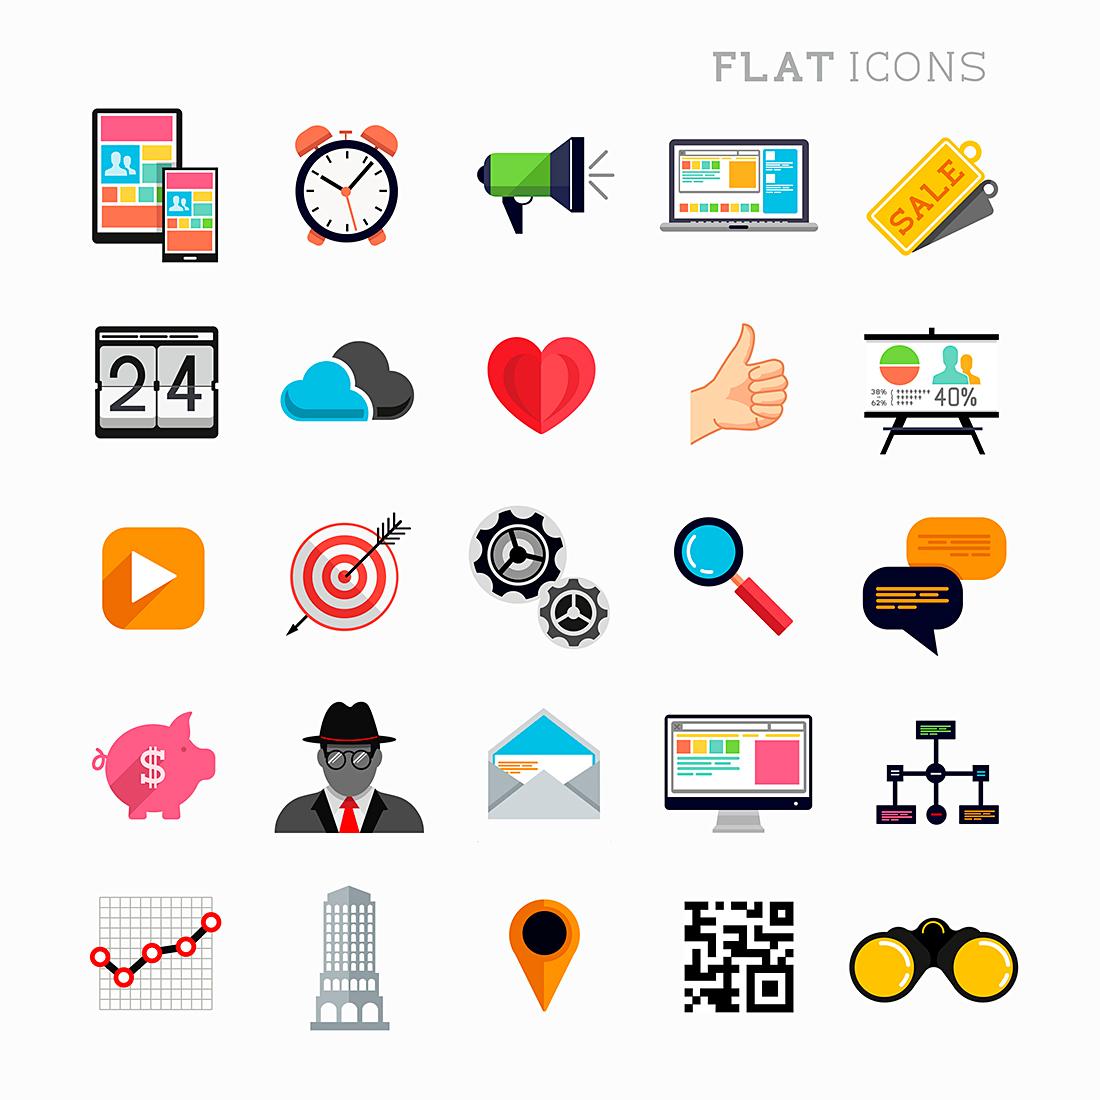 solarseven-modern-flat-%26-minimal-icons-1